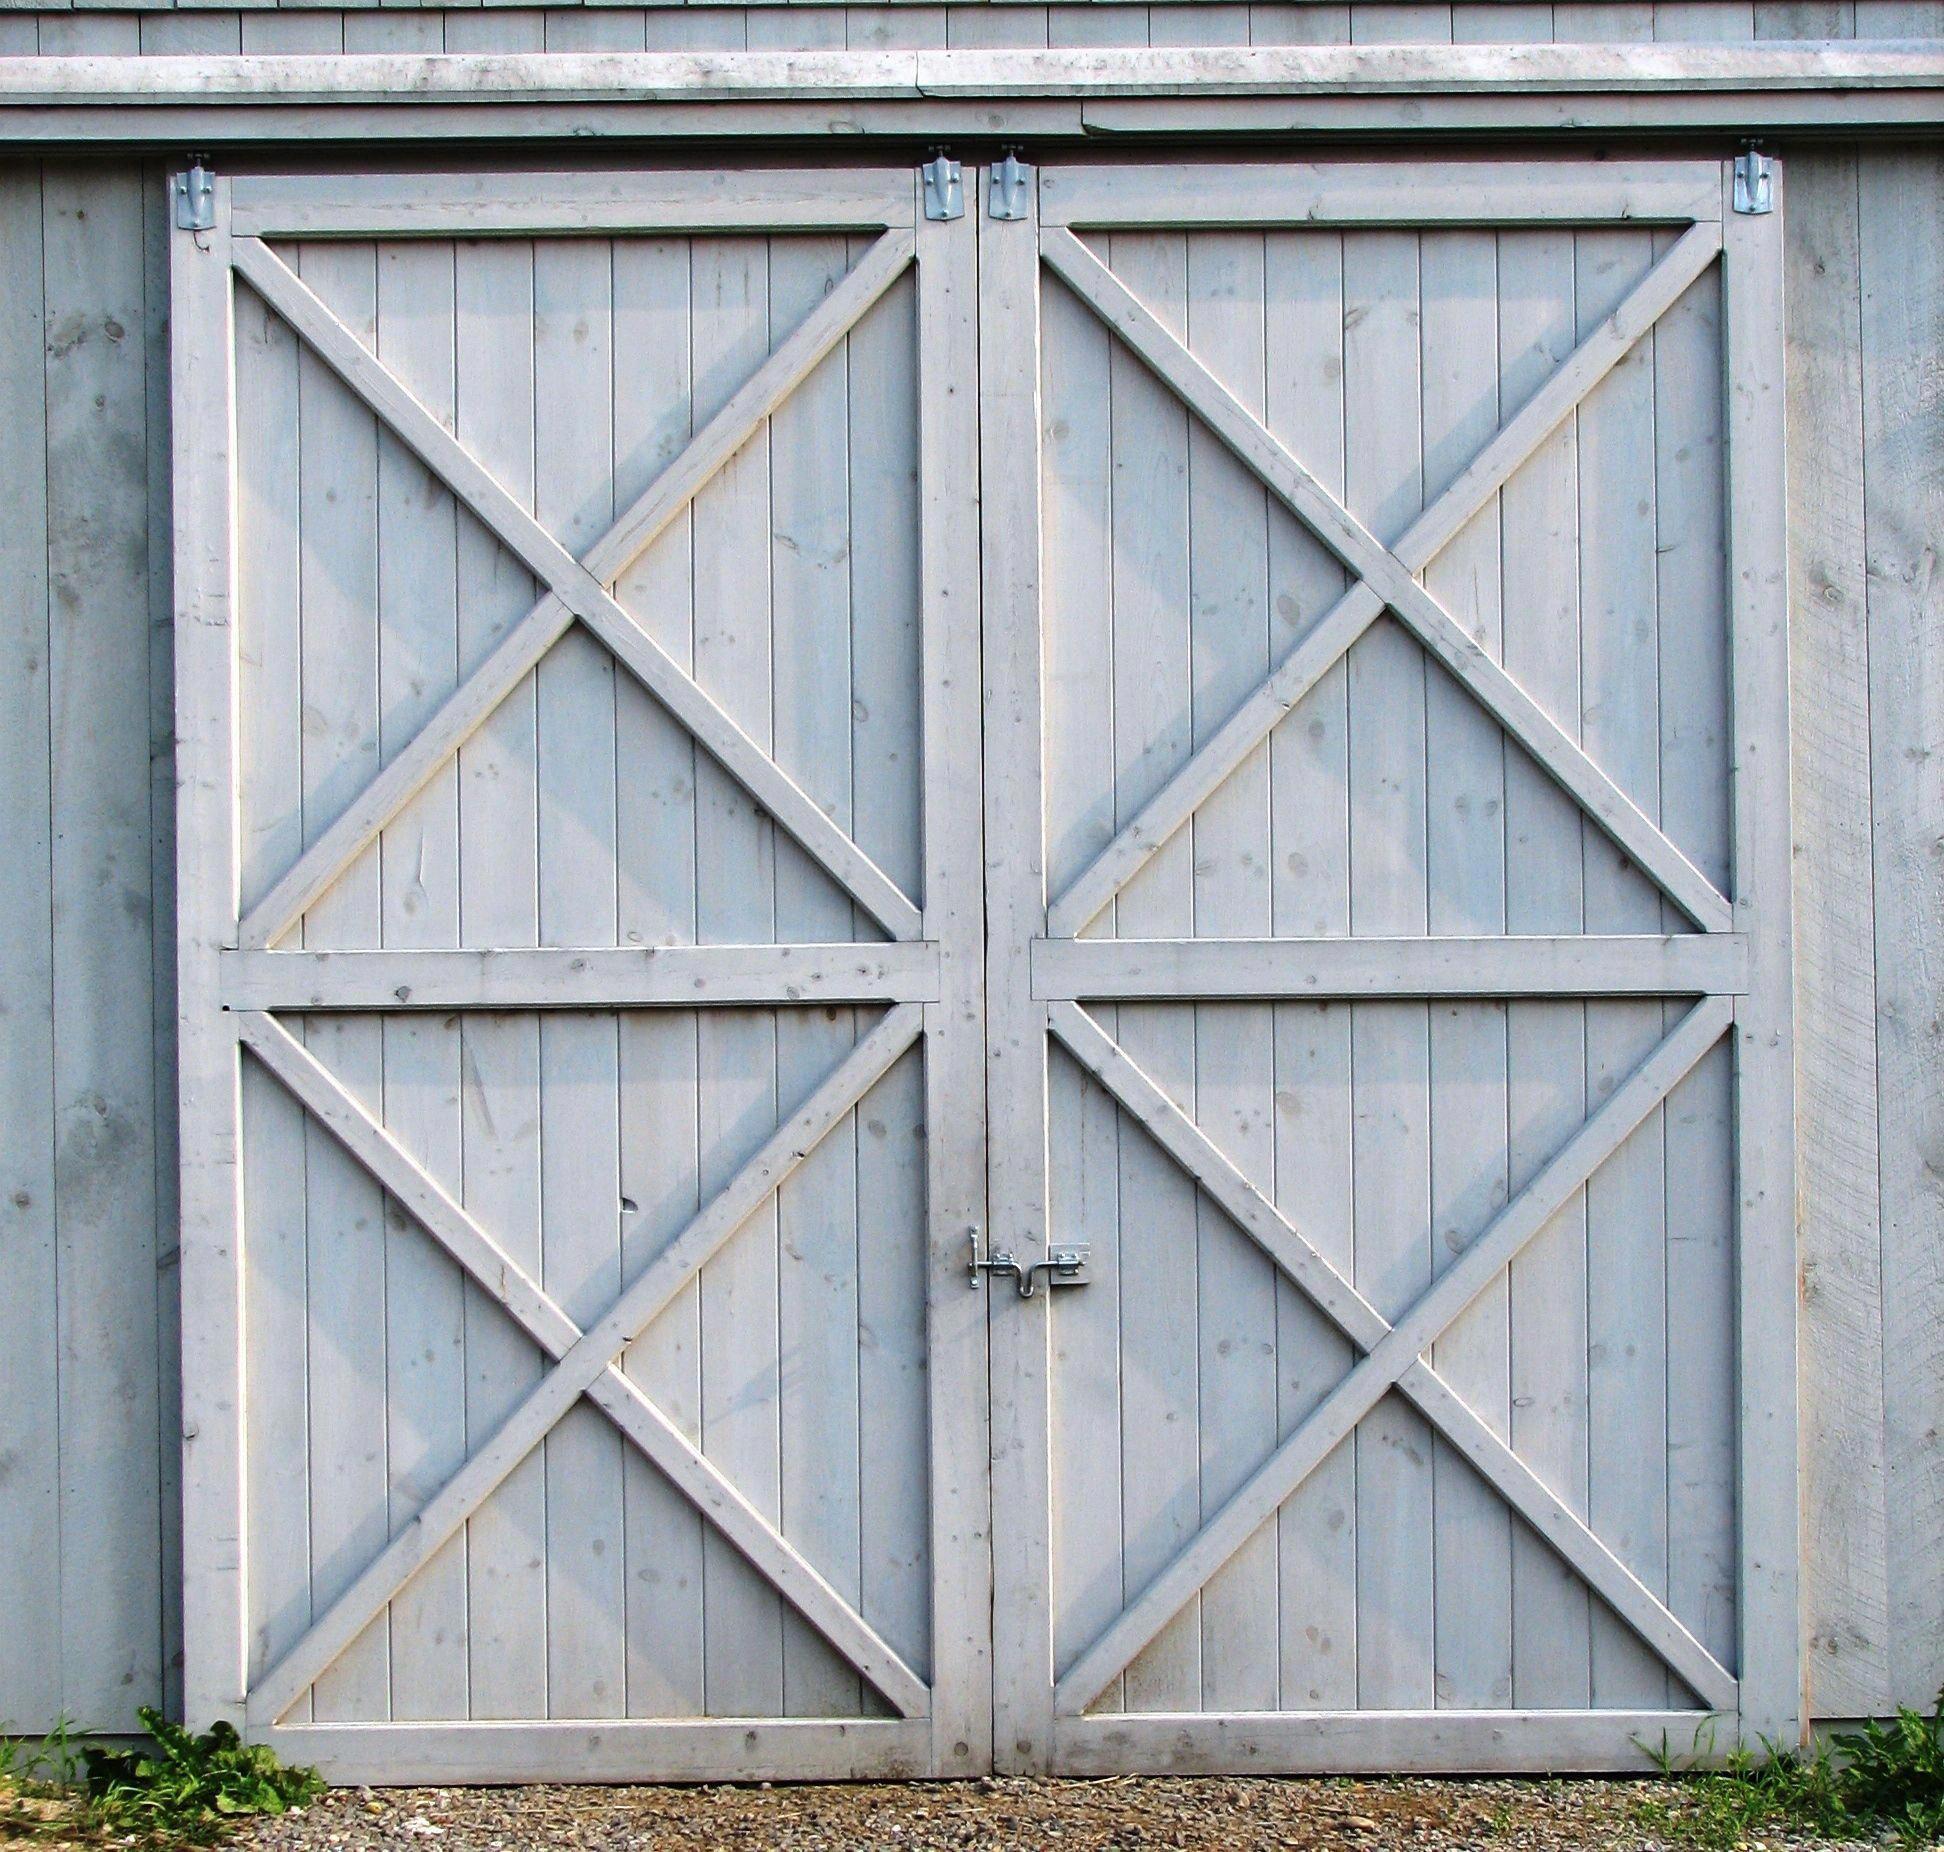 Barn Door Rails How To Build A Barn Door Barn Like Sliding Doors 20190330 Exterior Barn Doors Barn Doors Sliding Barn Door